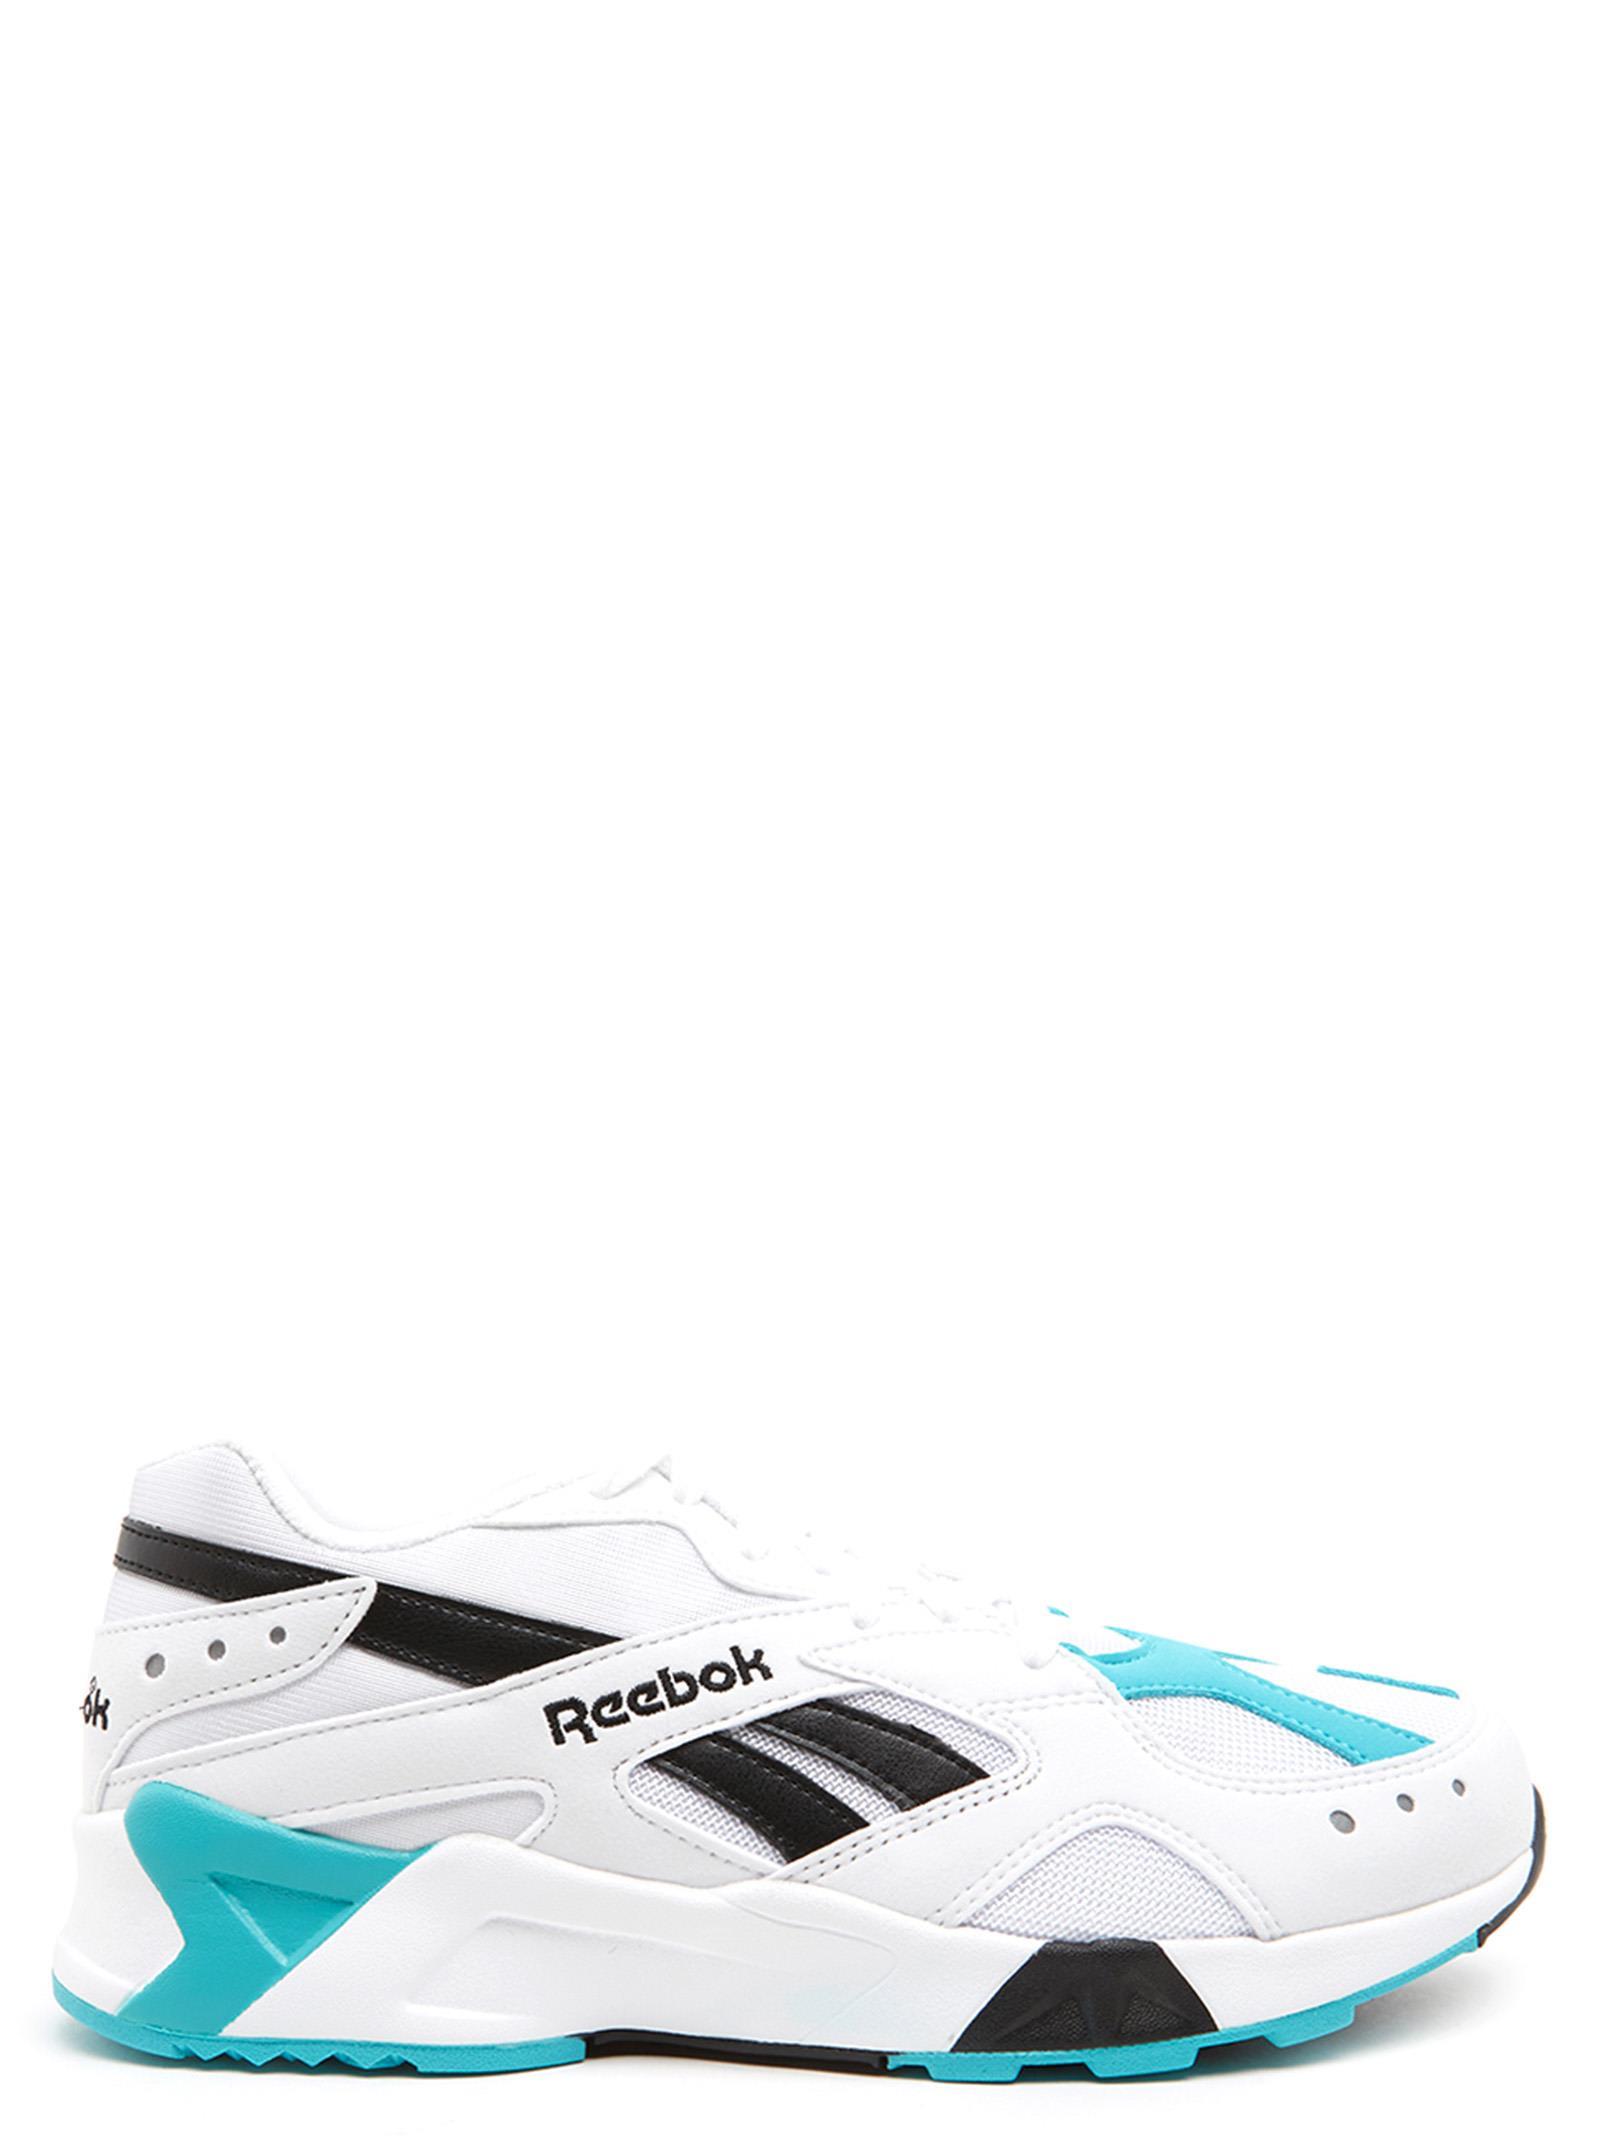 023b22a0c1 Reebok 'aztrek' Shoes